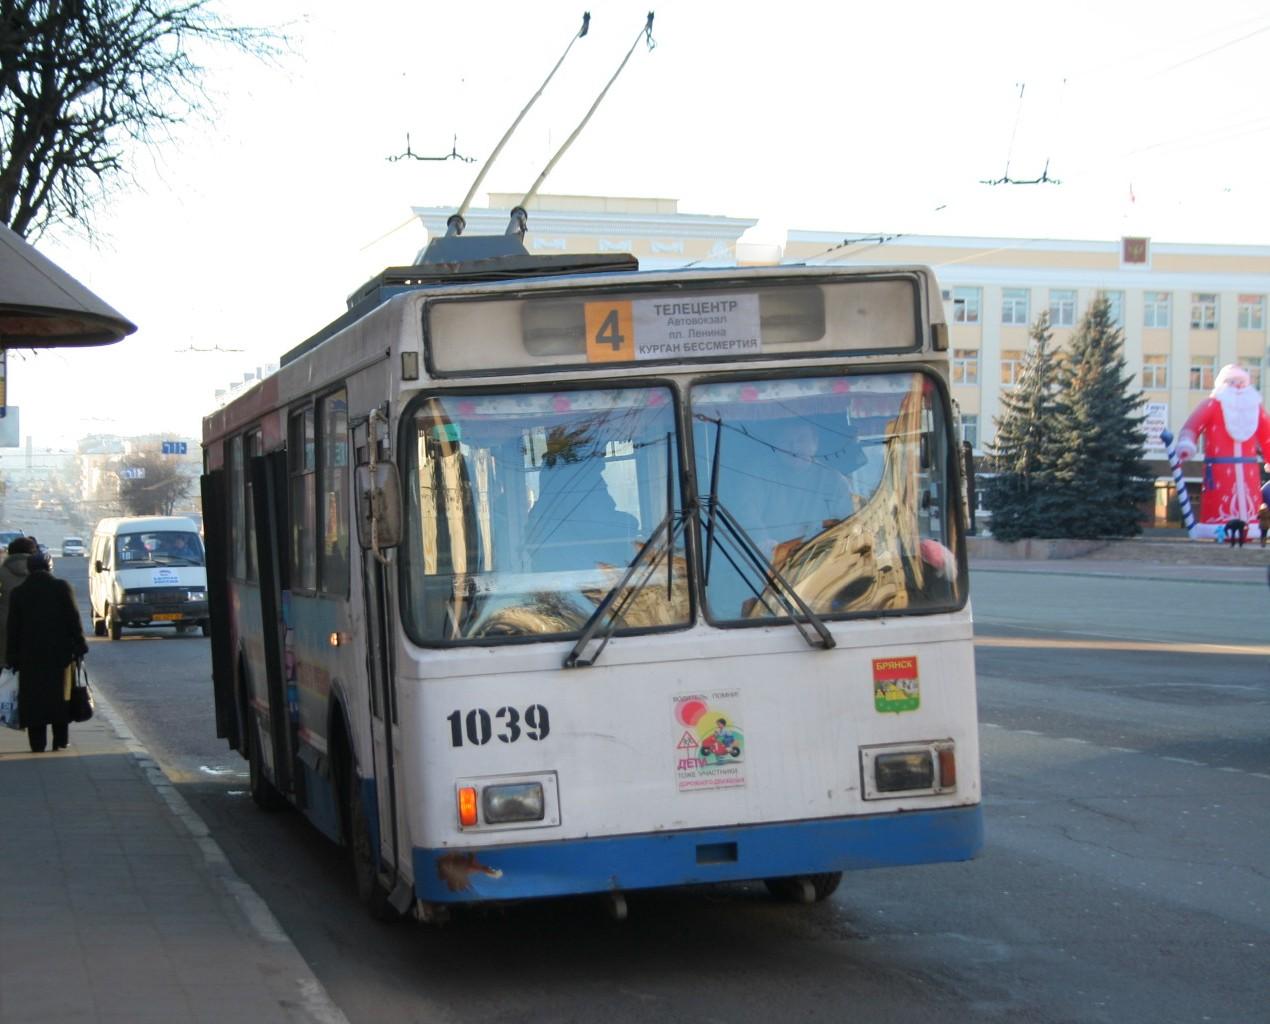 File:Trolleybus Bryansk 1039.jpg